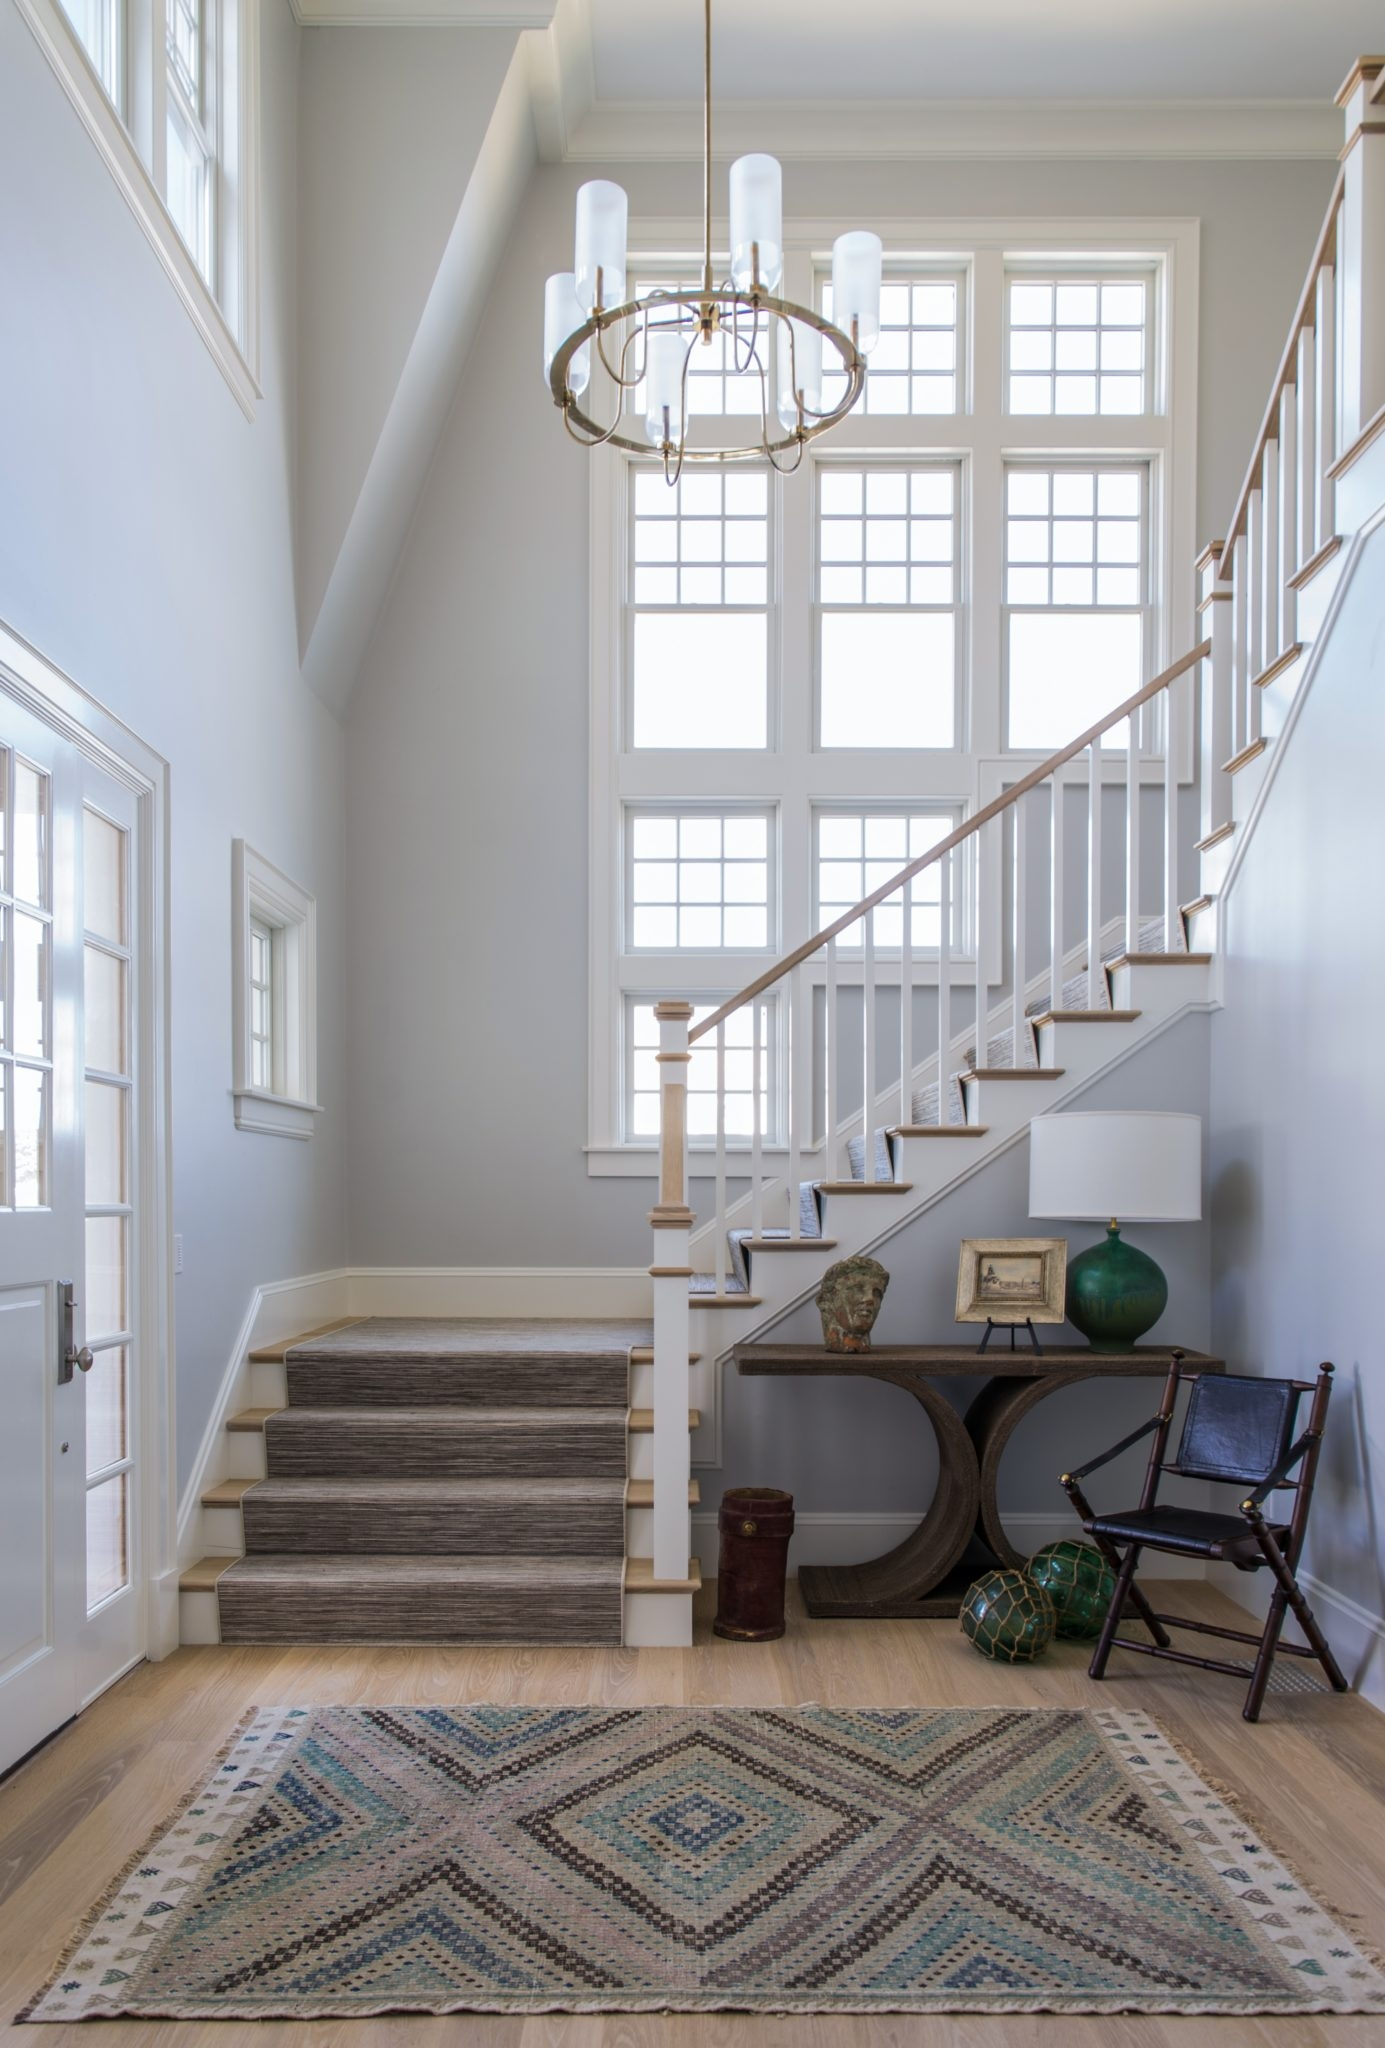 35 Stairwell Decorating Ideas Chairish Blog   Cape Cod Staircase Designs   Raised Bungalow Deck   Layered   Interior   Veranda Step   Stair